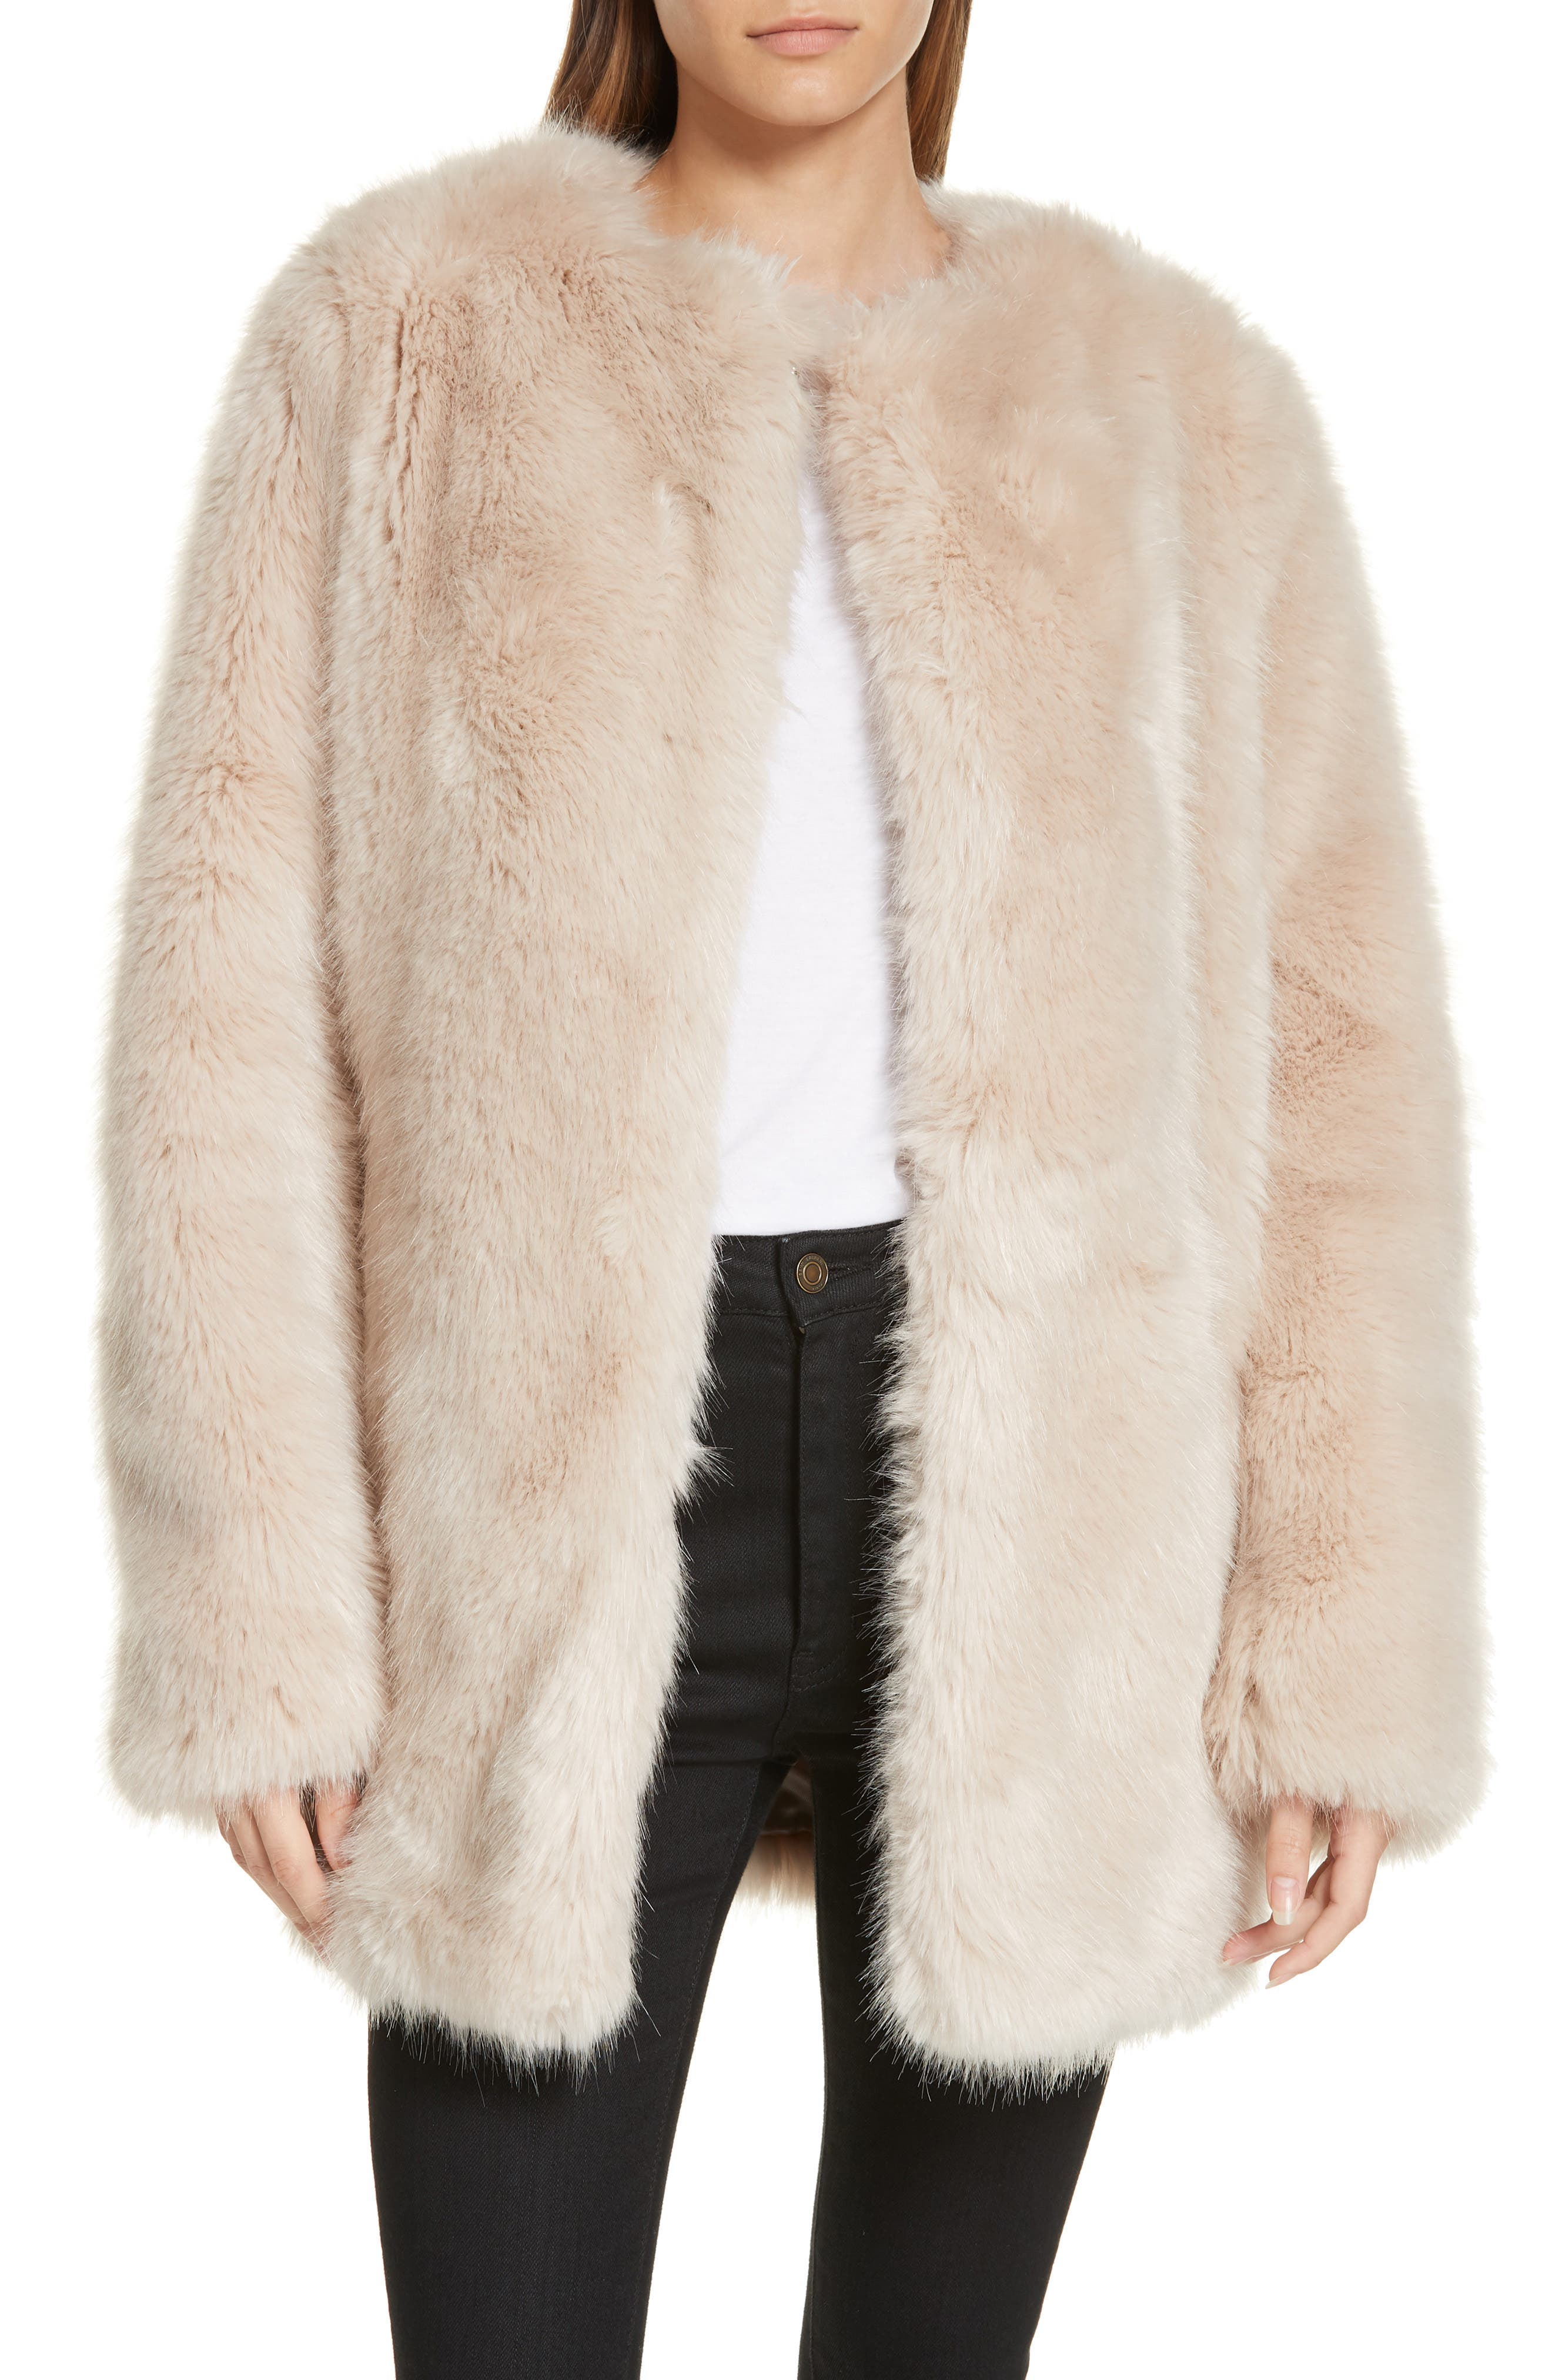 HELMUT LANG Faux Fur Coat, Main, color, OATMEAL